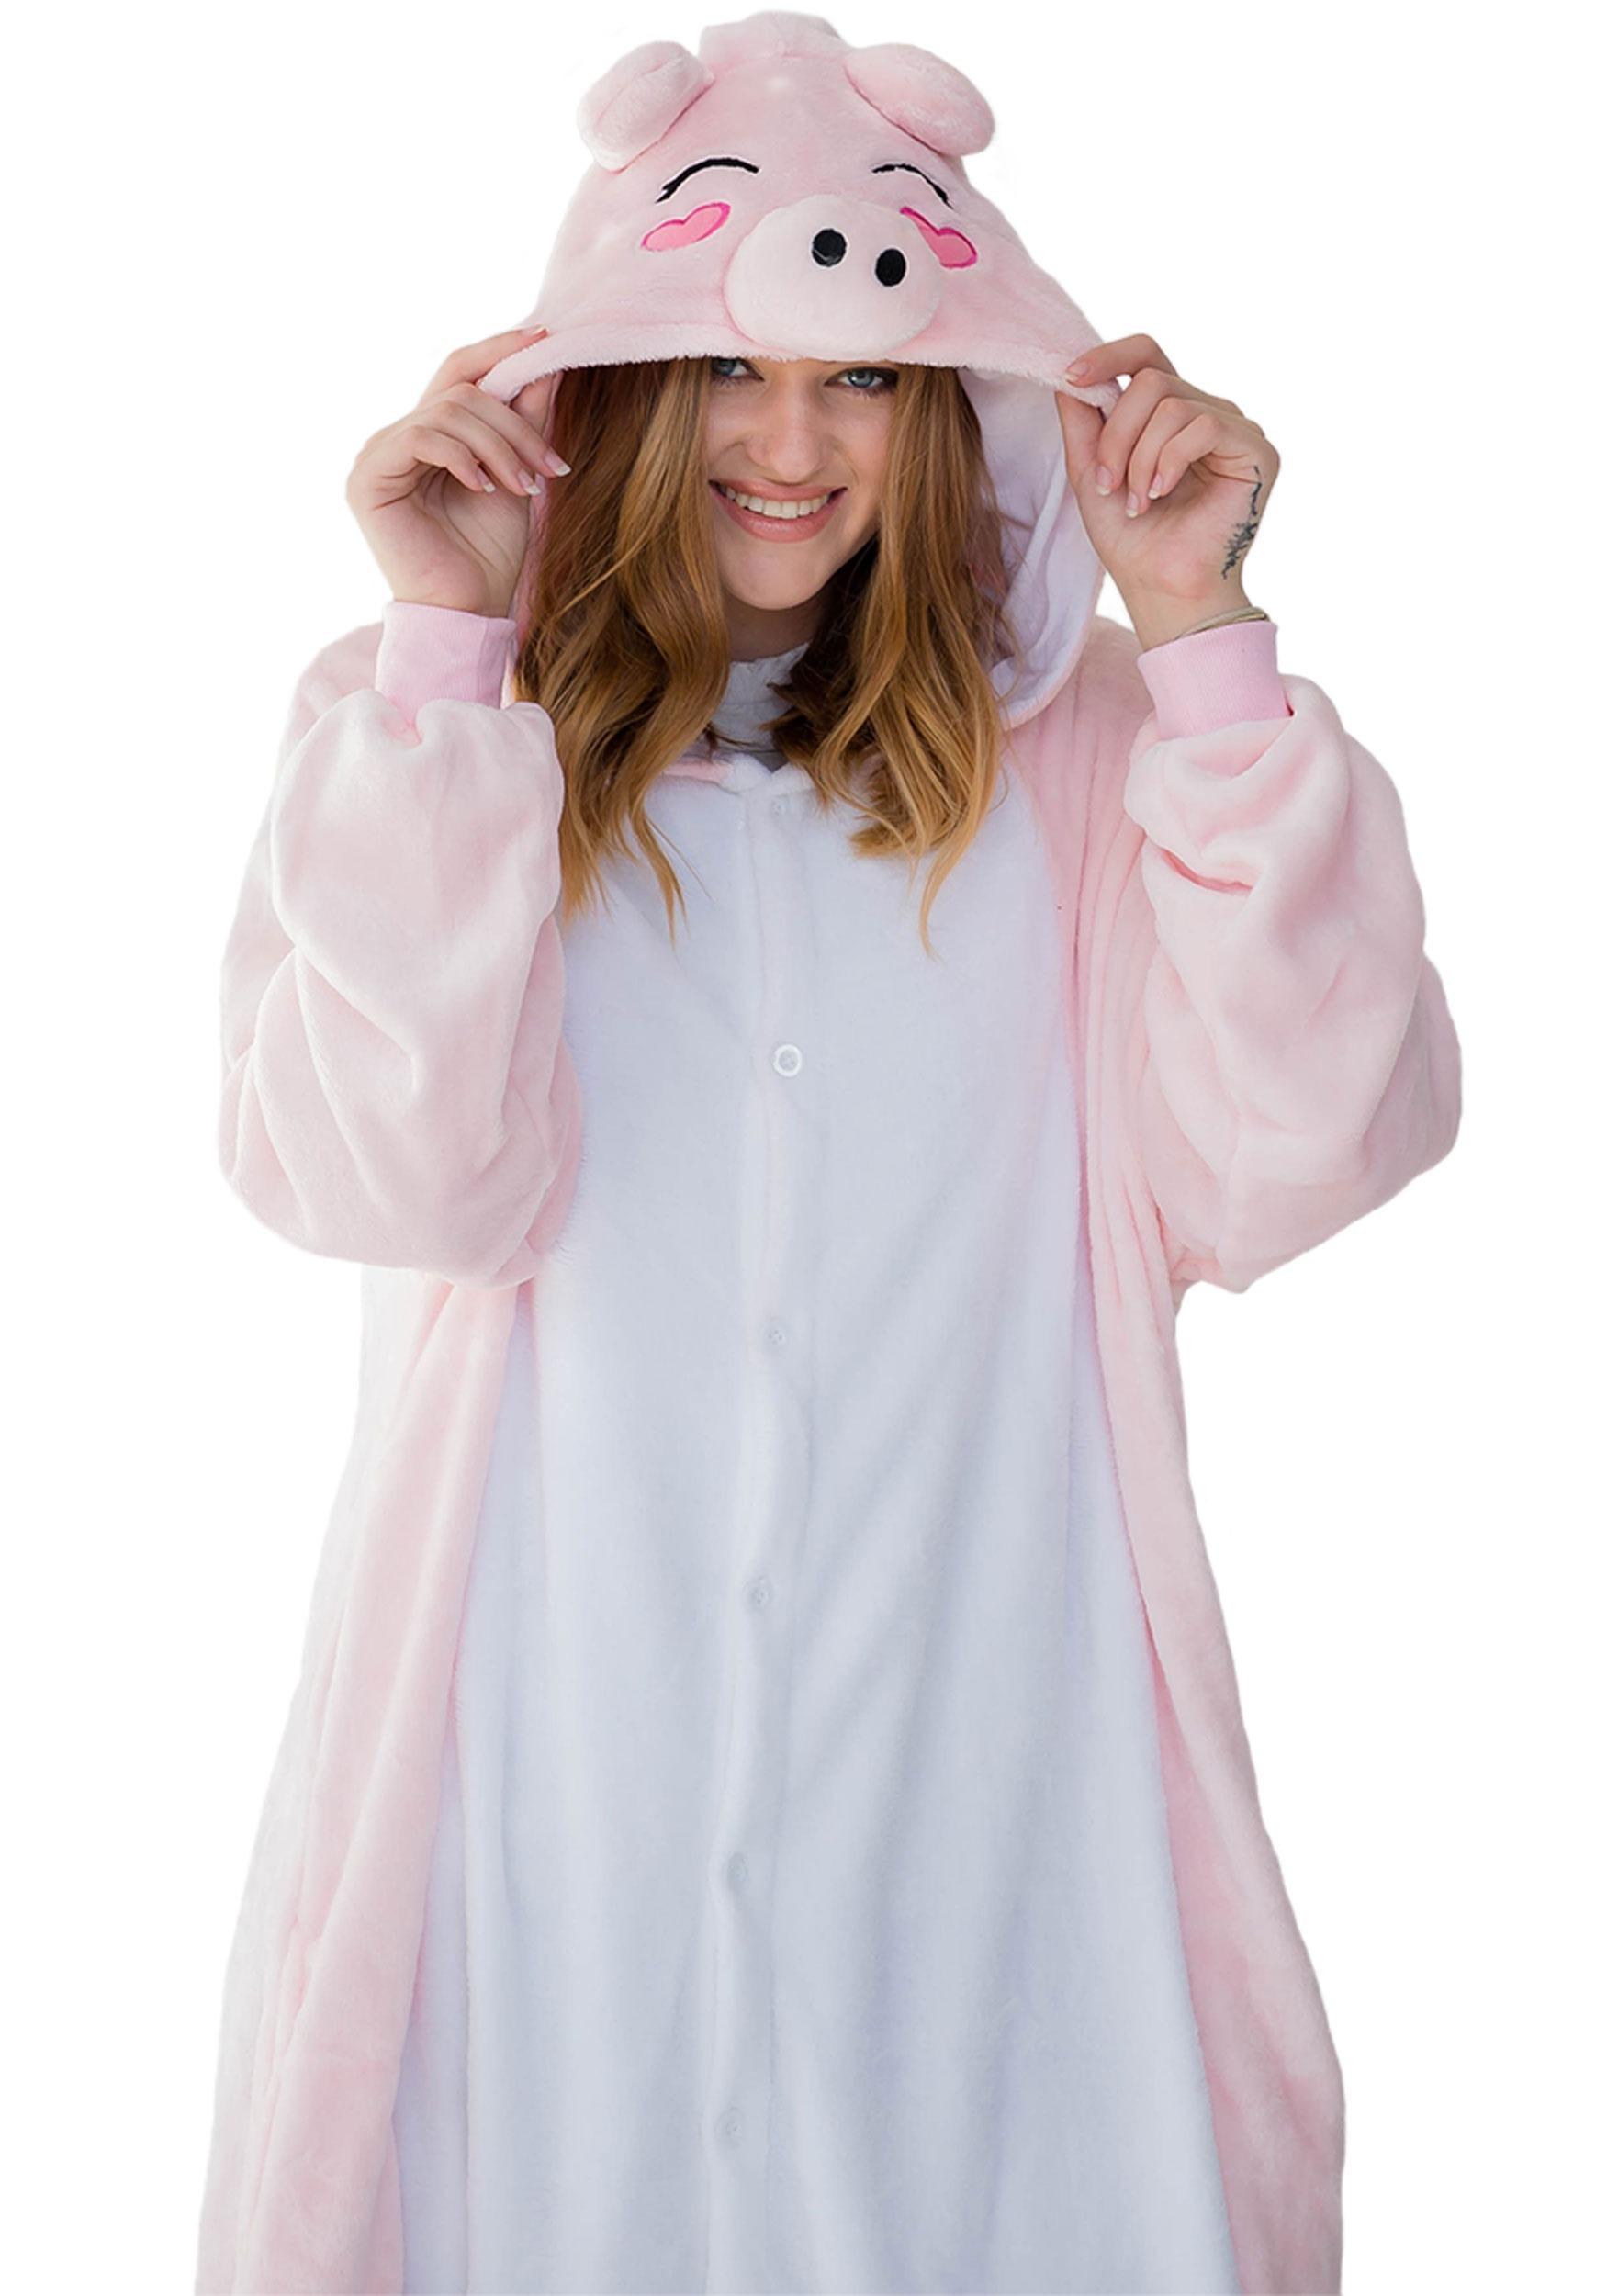 Adult Pig Yumio Kigurumi Costume